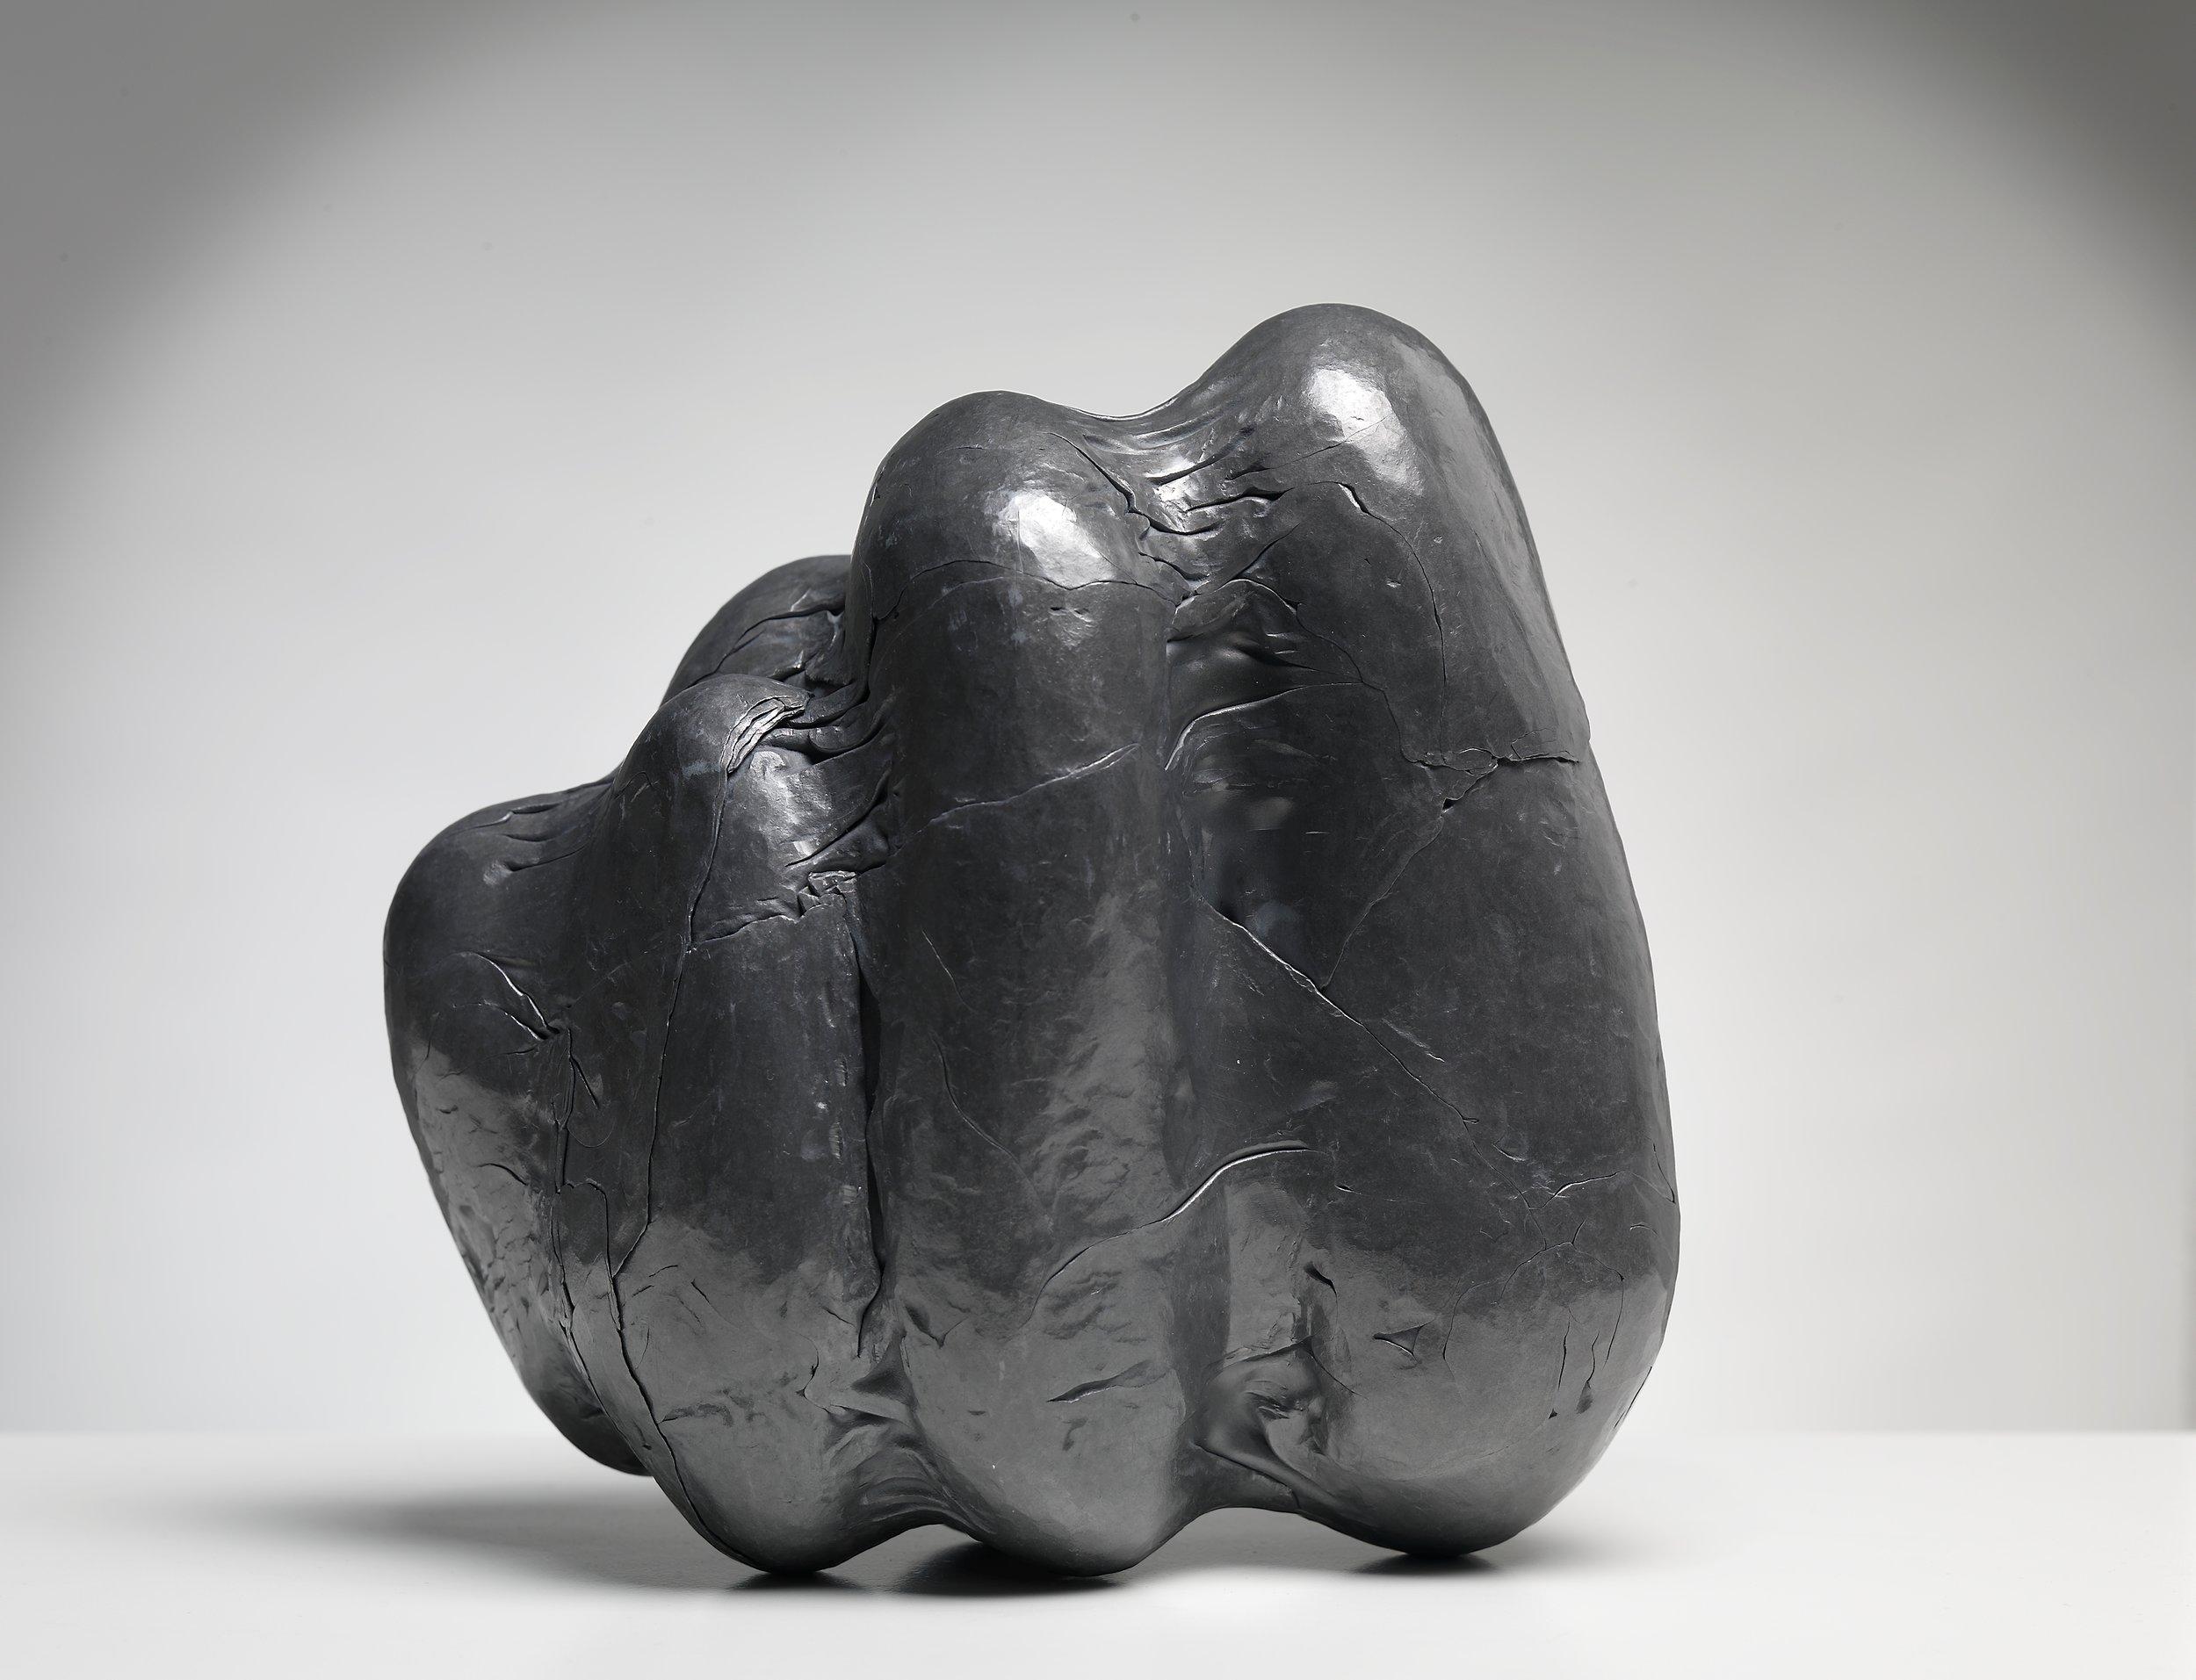 Tone Vigeland, Skulptur II, 1999 © Tone Vigeland / BONO Foto: Nasjonalmuseet